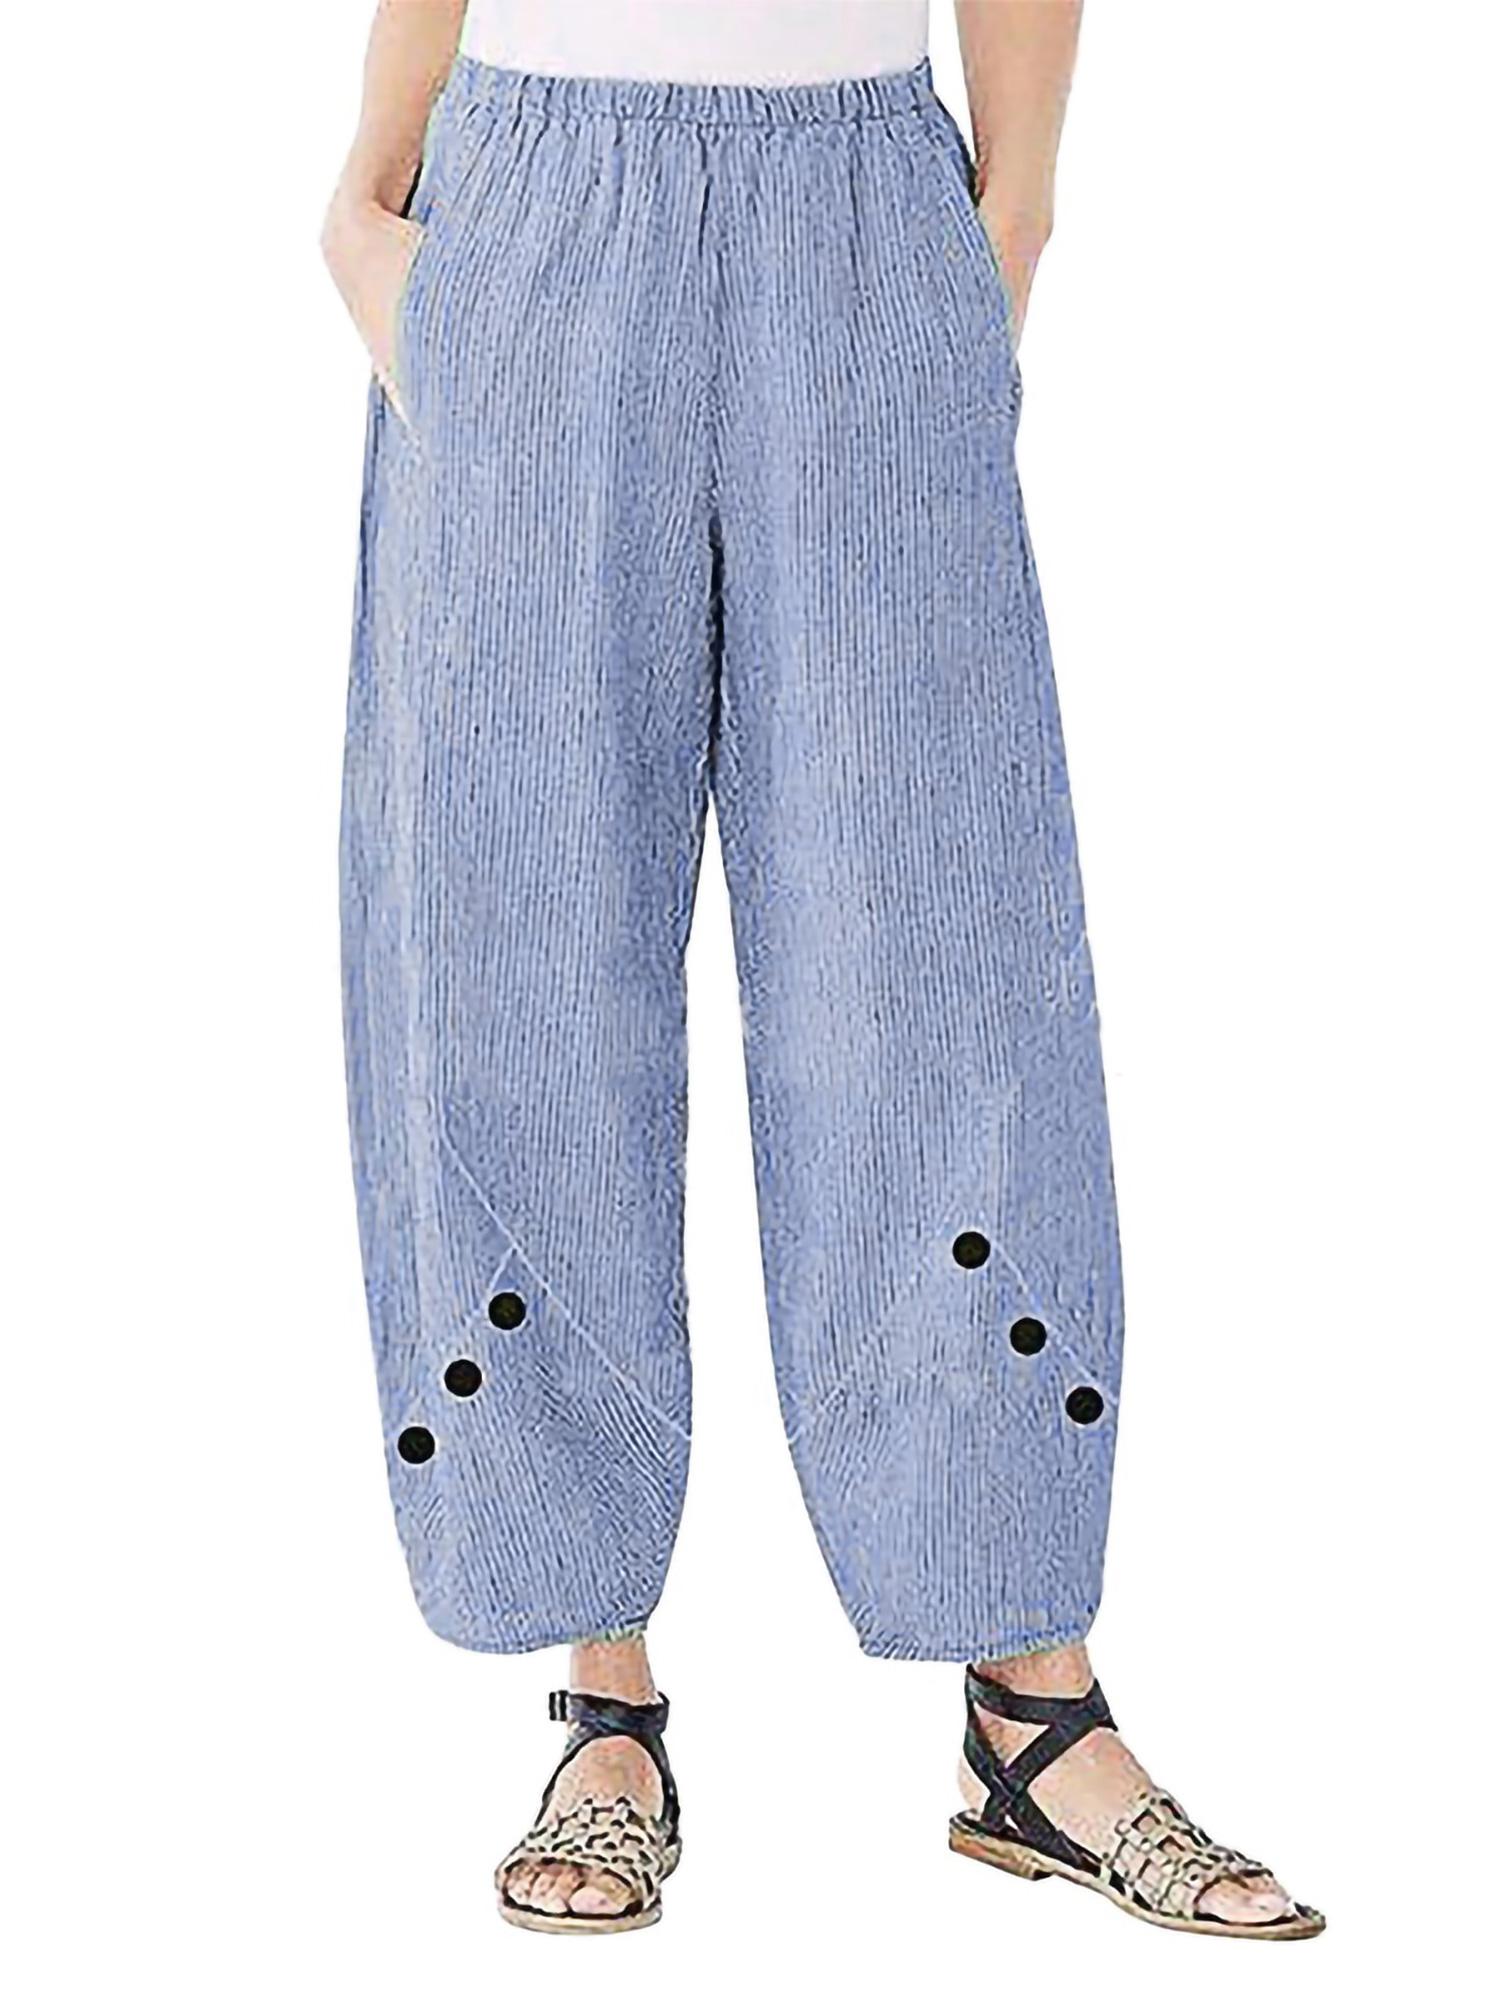 Plus Size Women/'s Cotton Linen Wide Leg Pants Casual Loose Palazzo Long Trousers